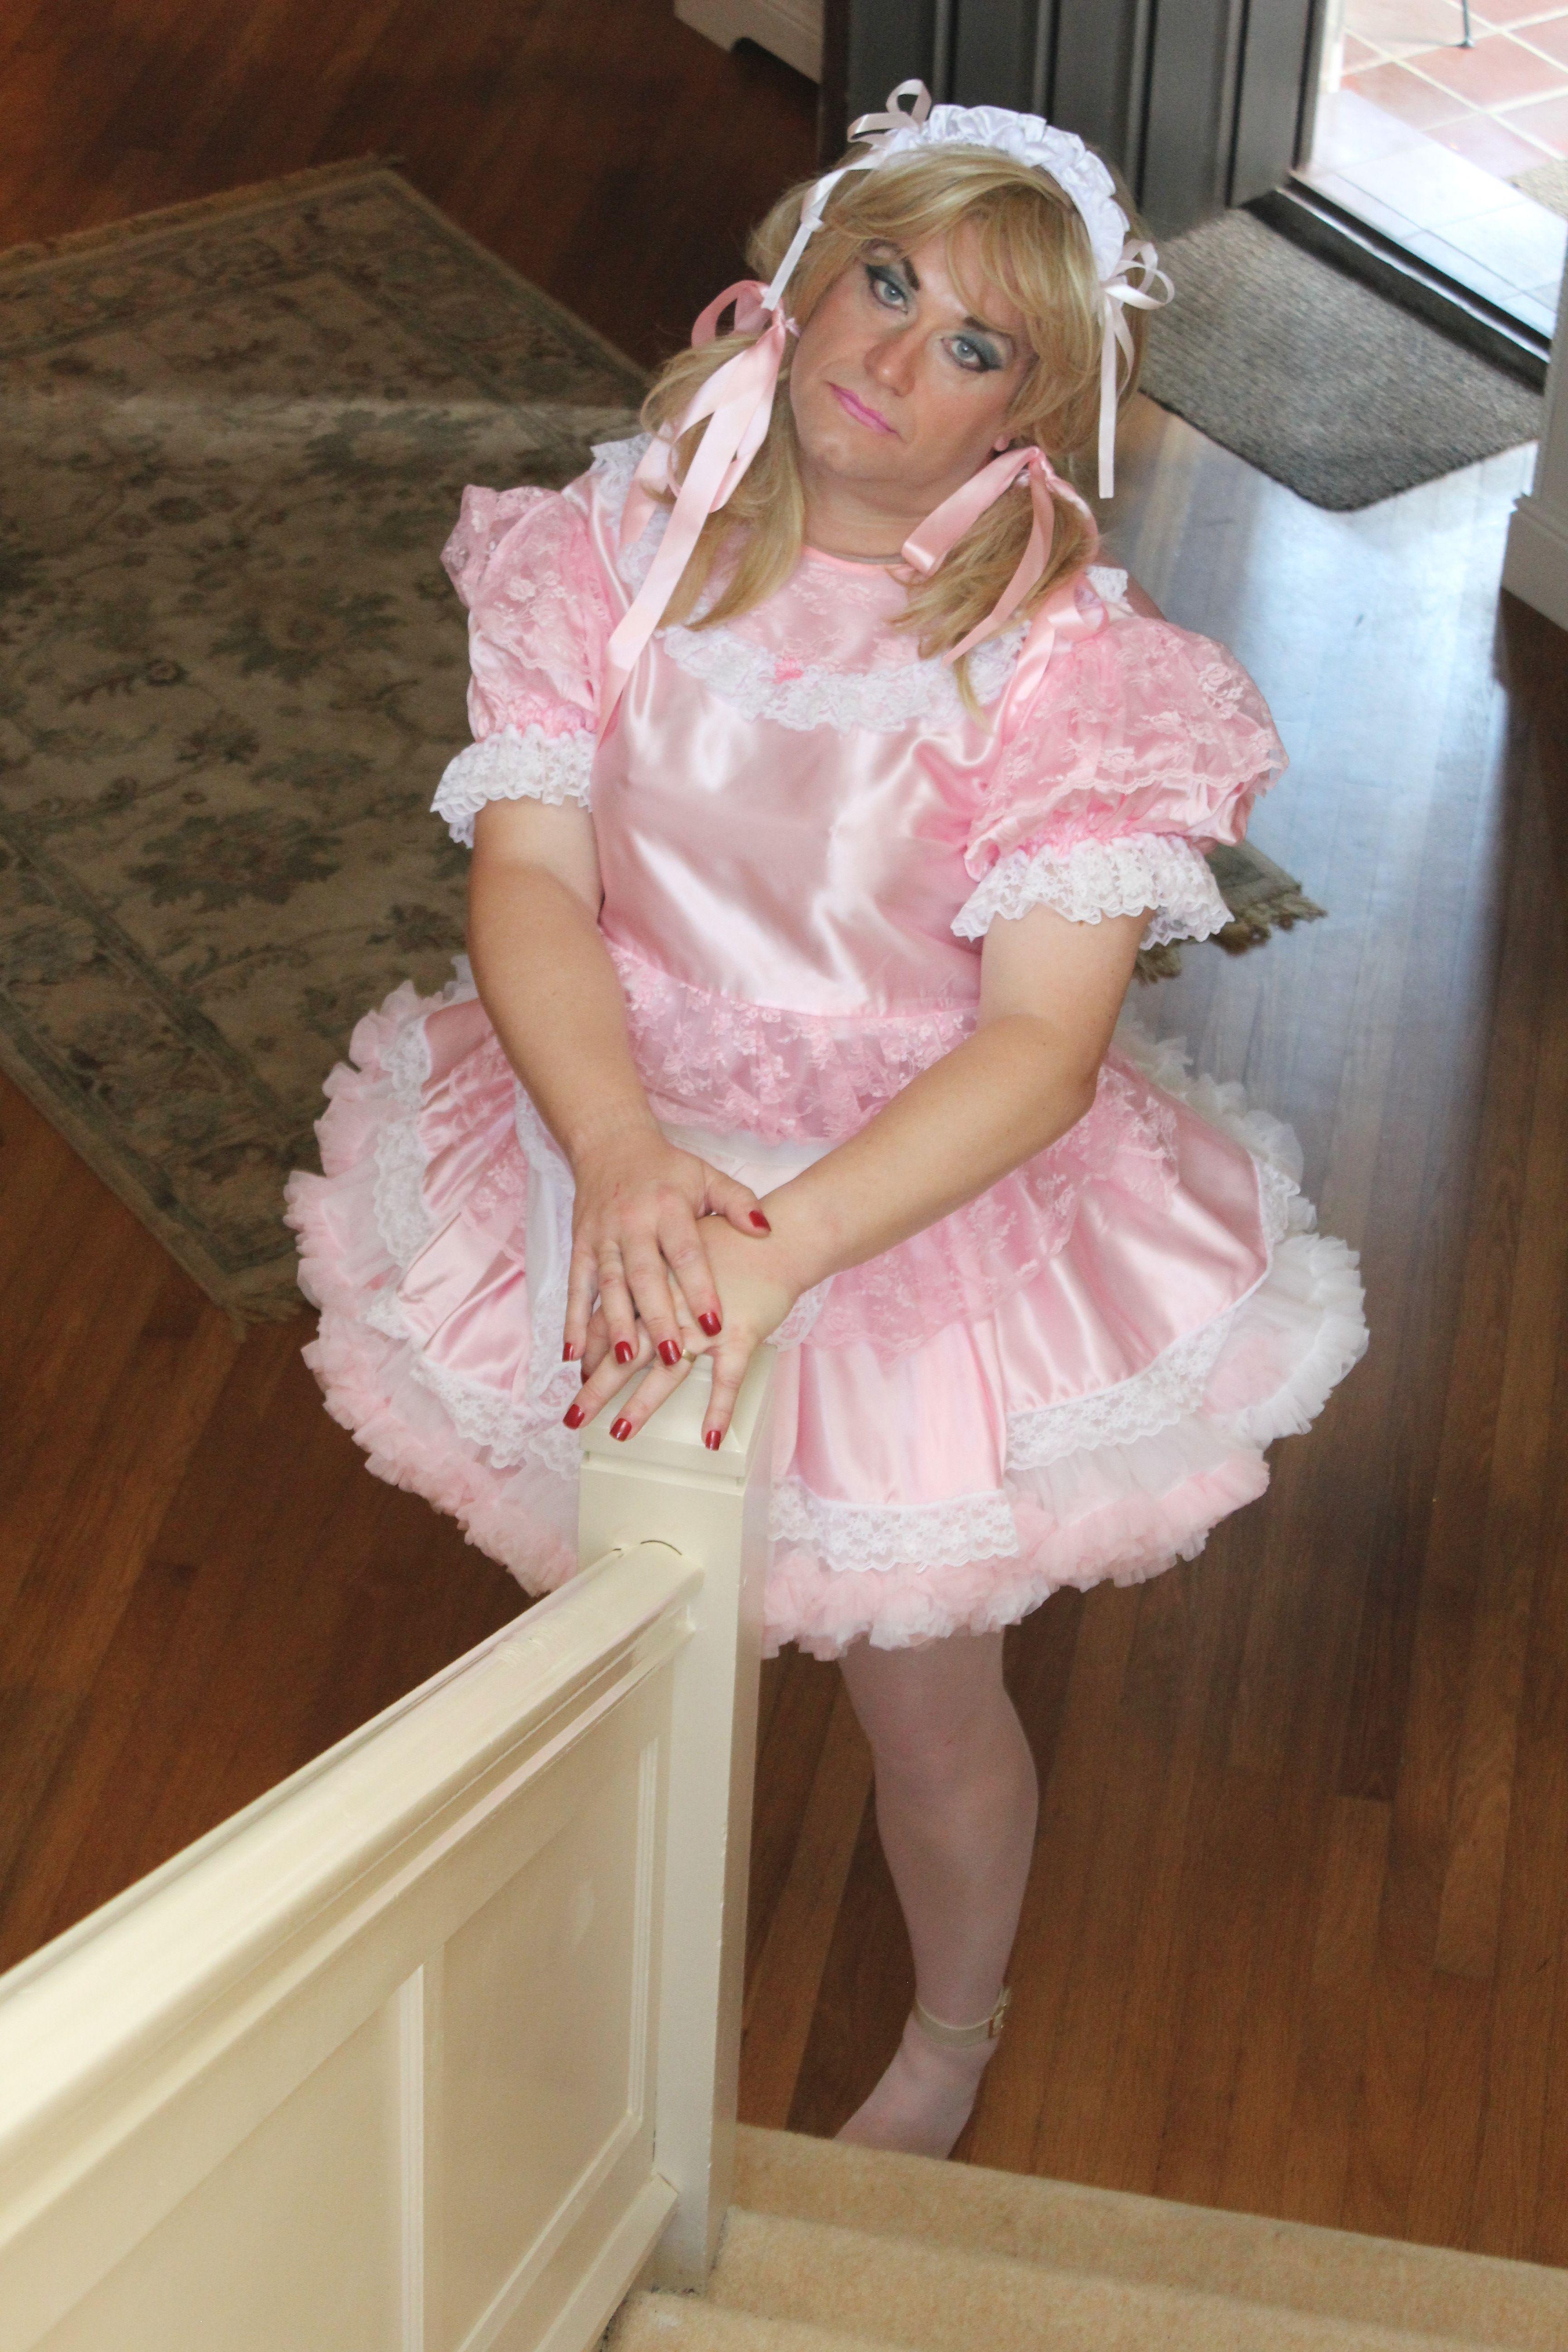 Frilly Sissy Tumblr within transvestite maid   transvestite   pinterest   maids, sissy maid